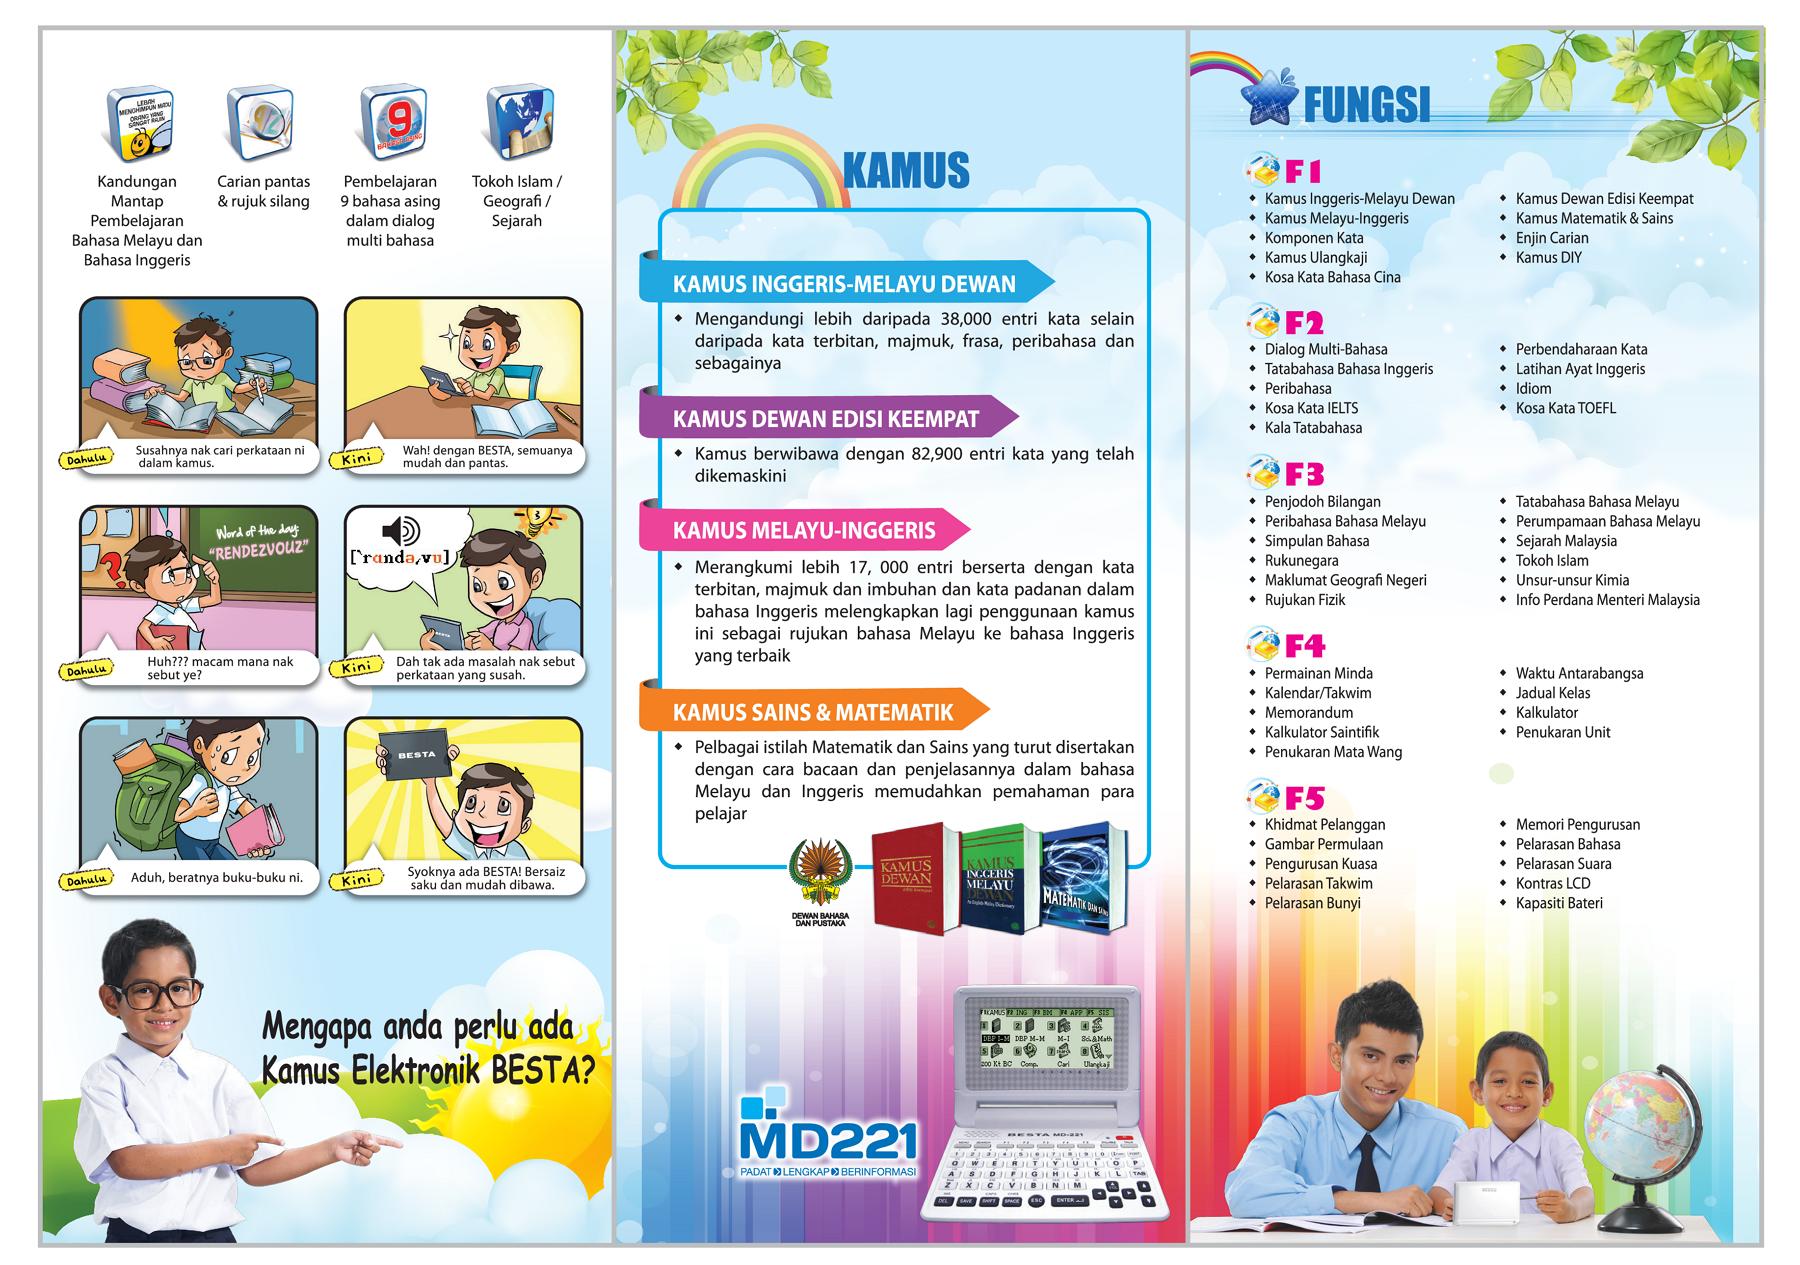 MD221 Brochure 2